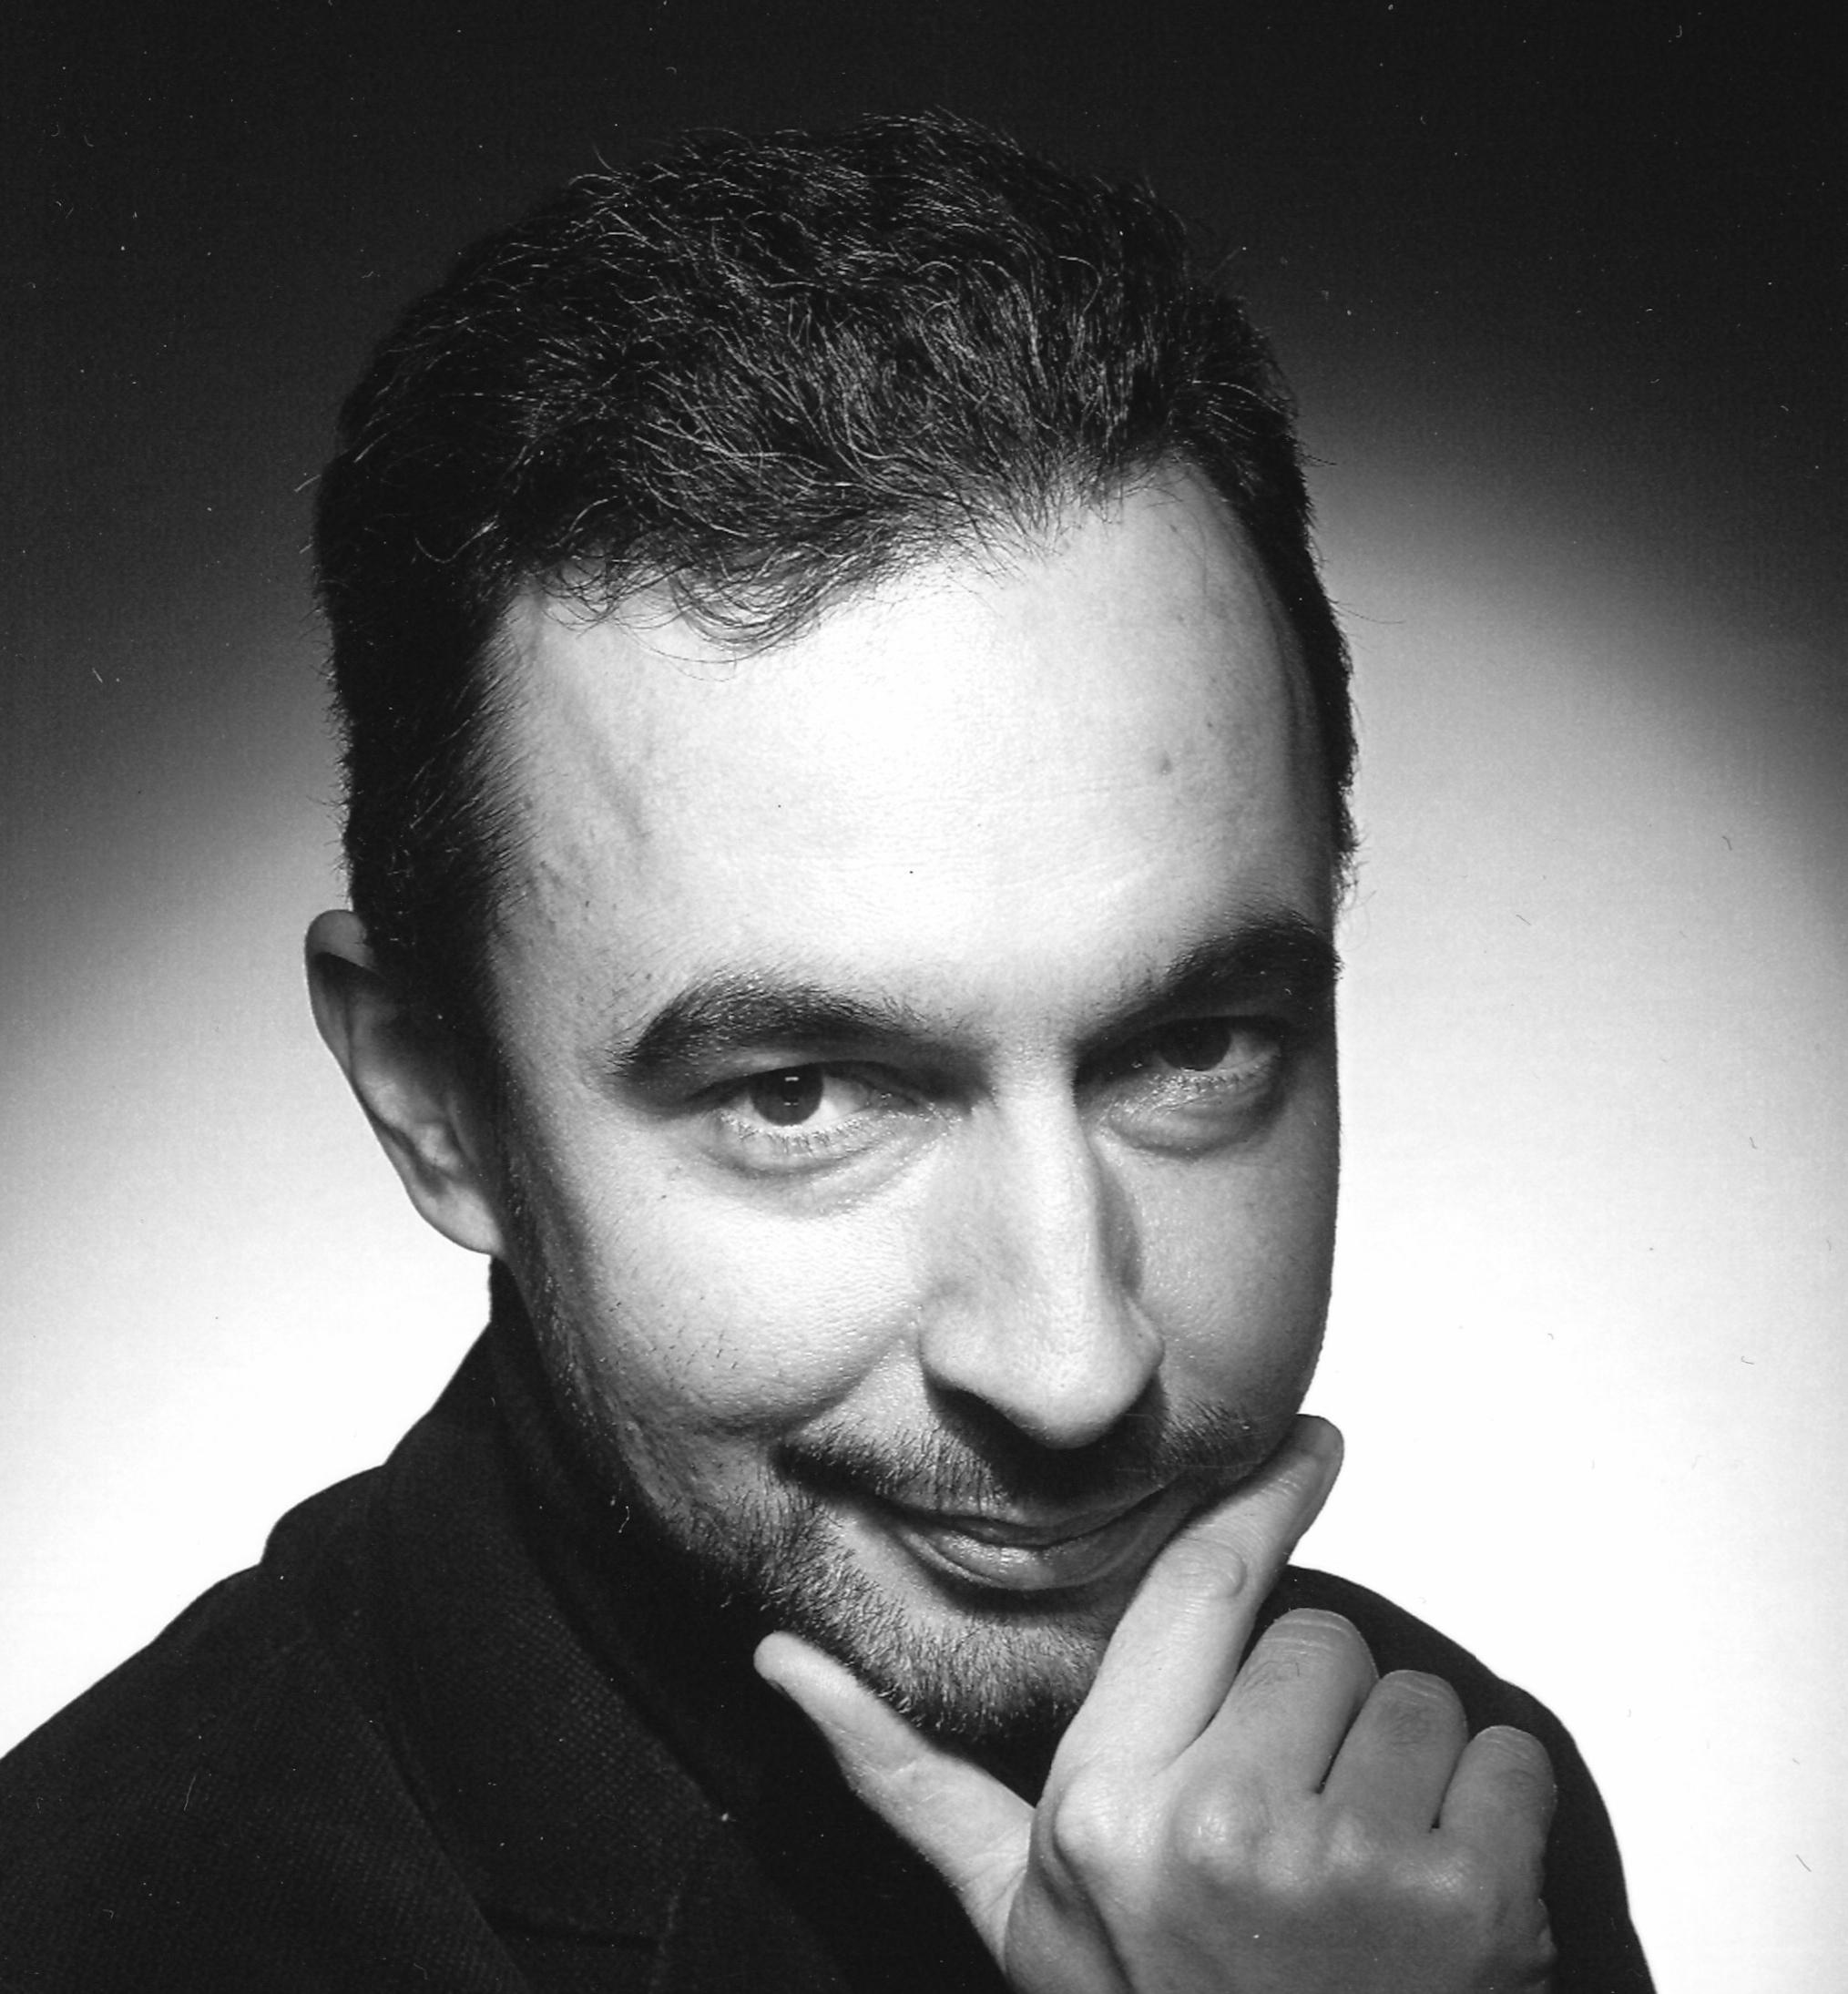 François-Xavier Faucher